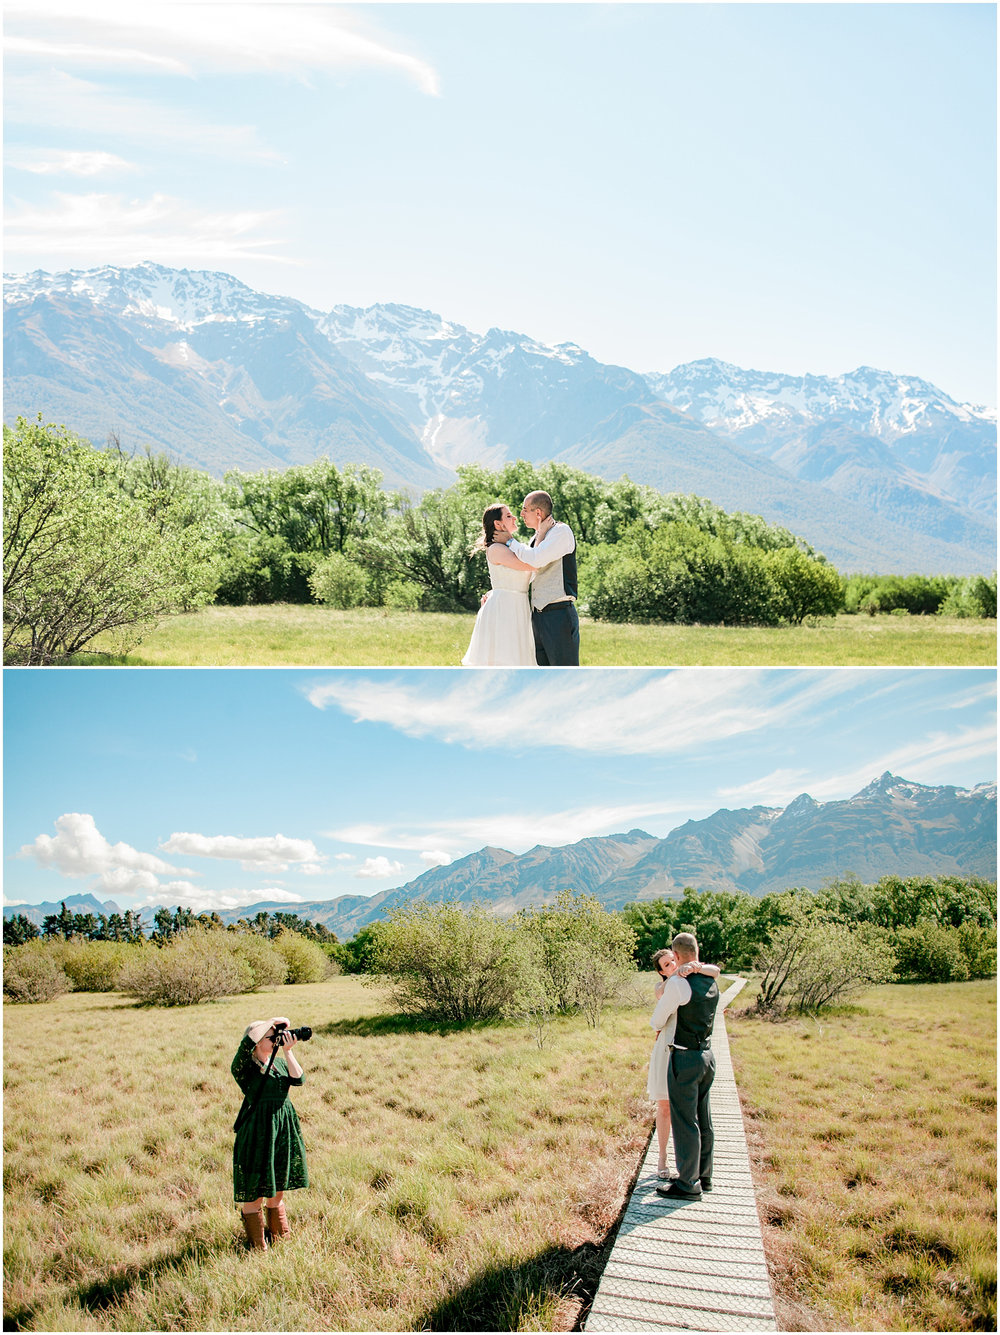 Queenstown New Zealand Wedding Photographer Bruna Fabricio Smetona Photo-0047.jpg